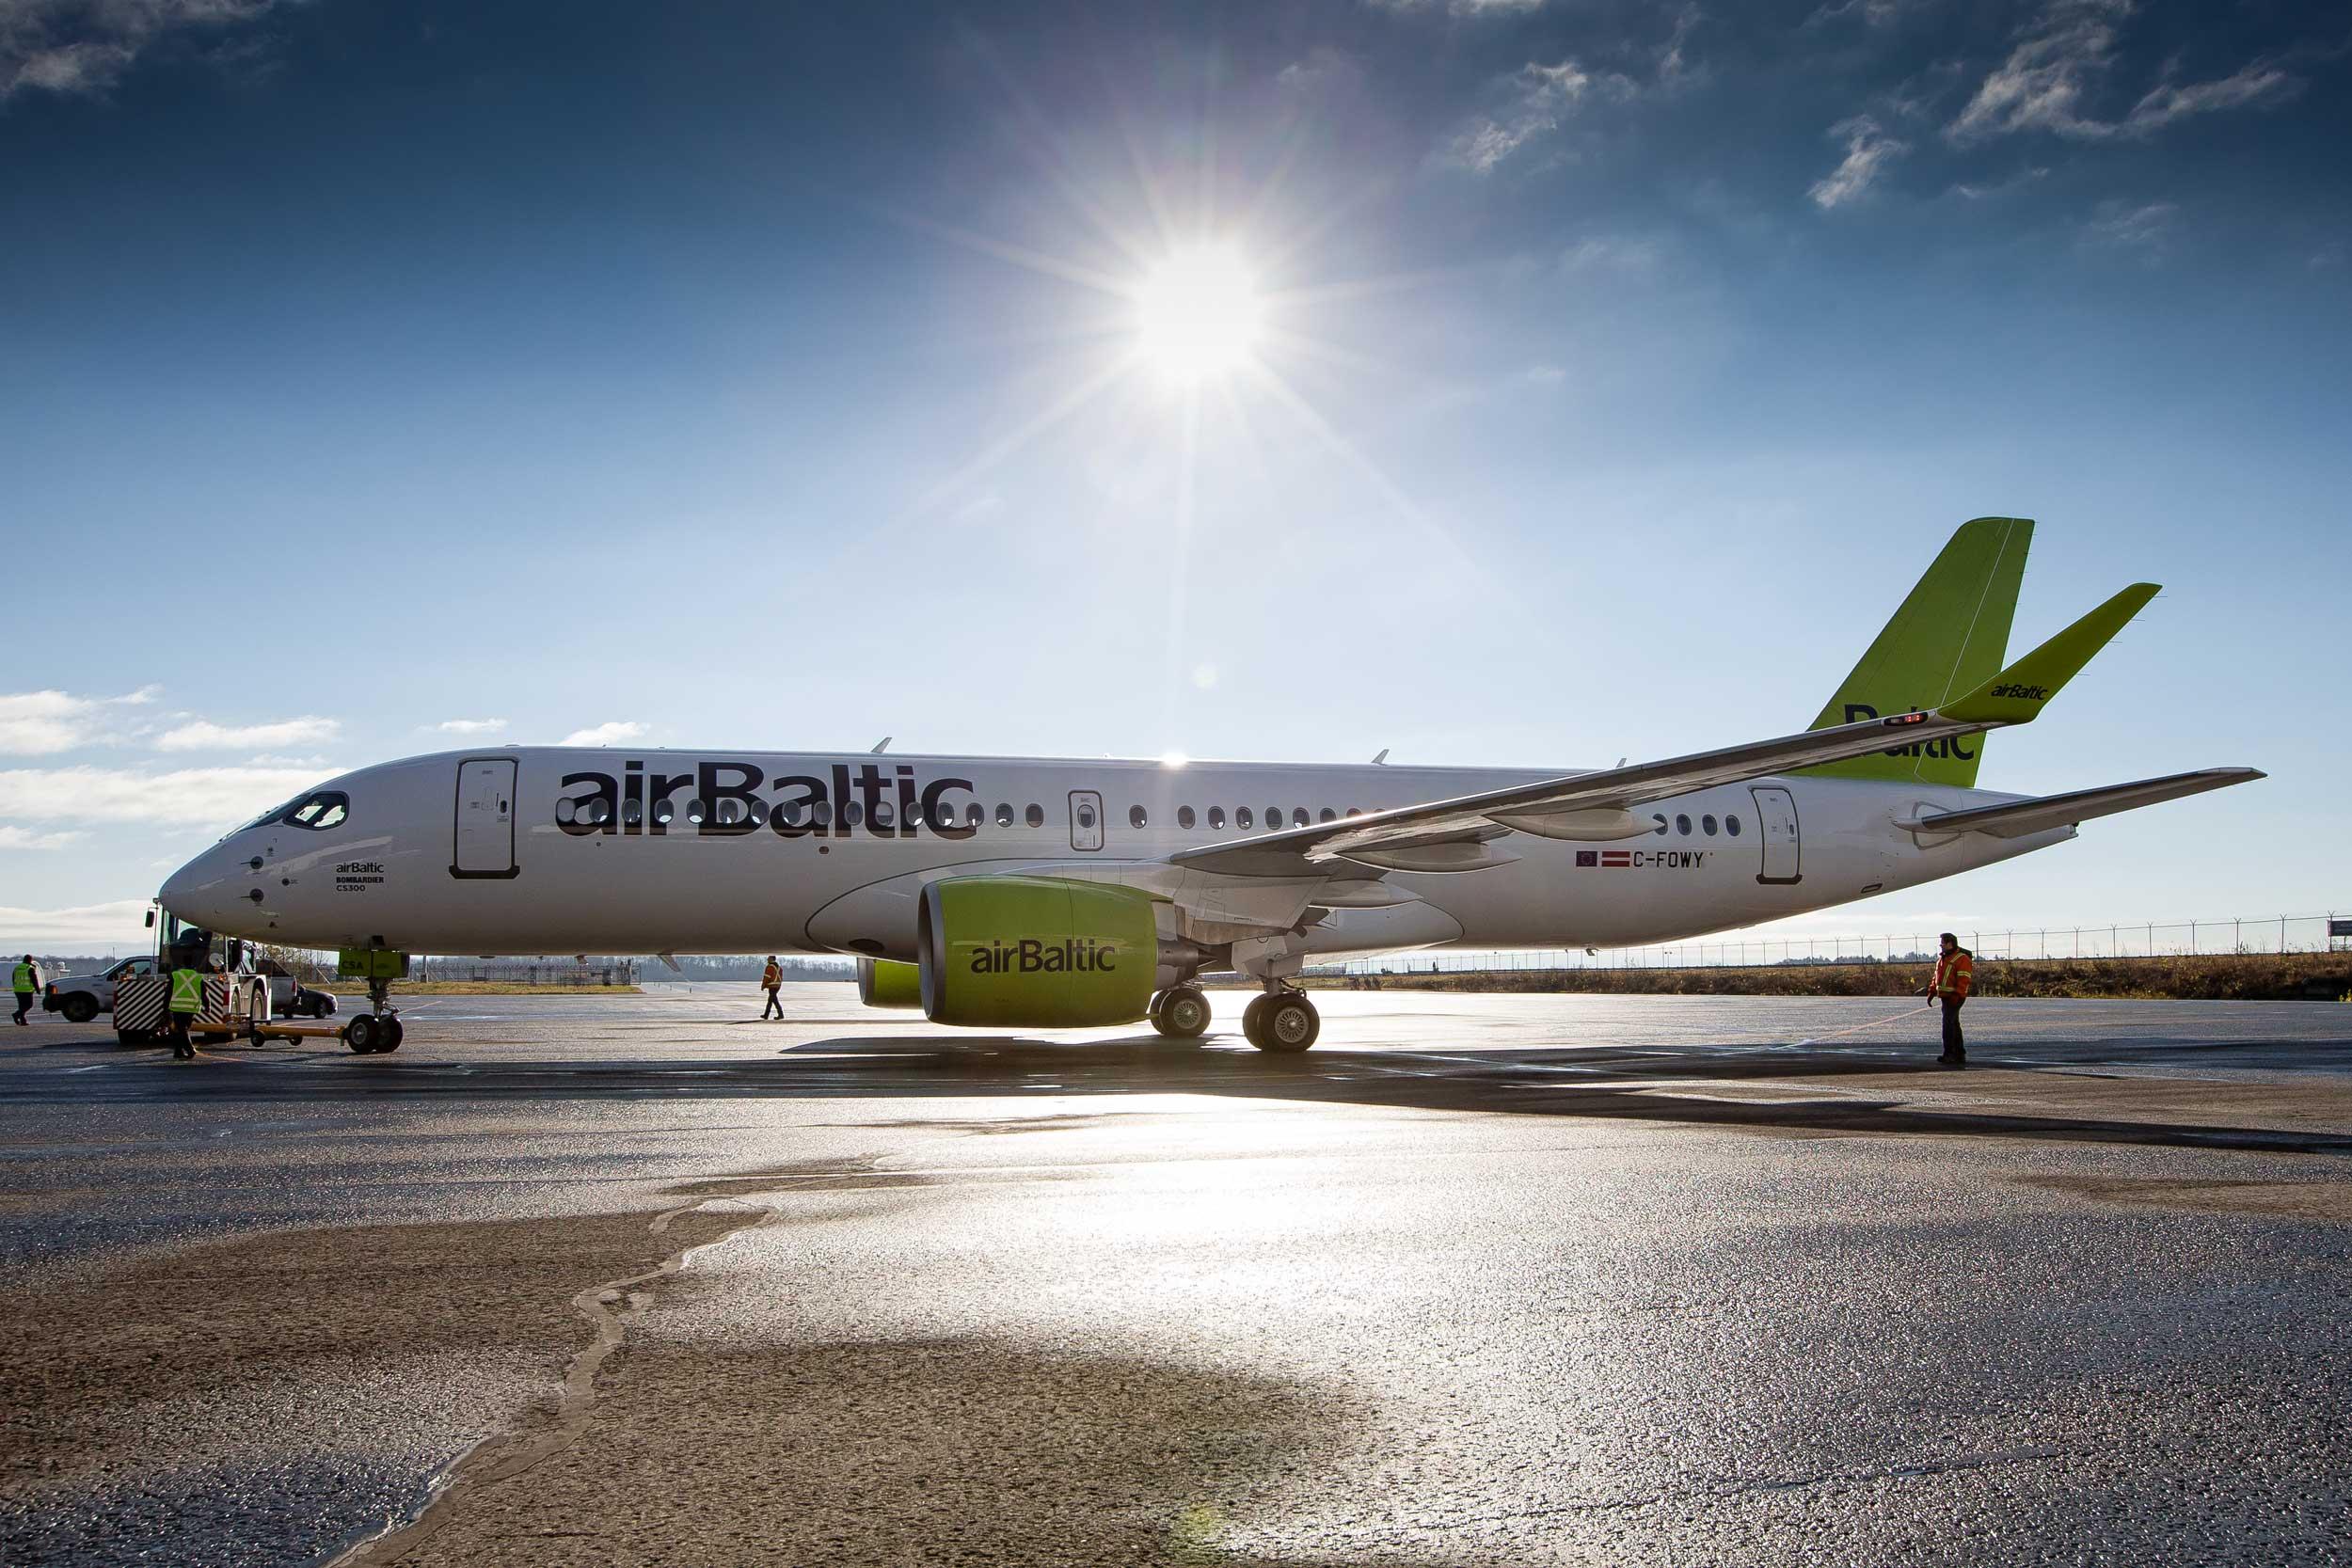 airBaltic C Series